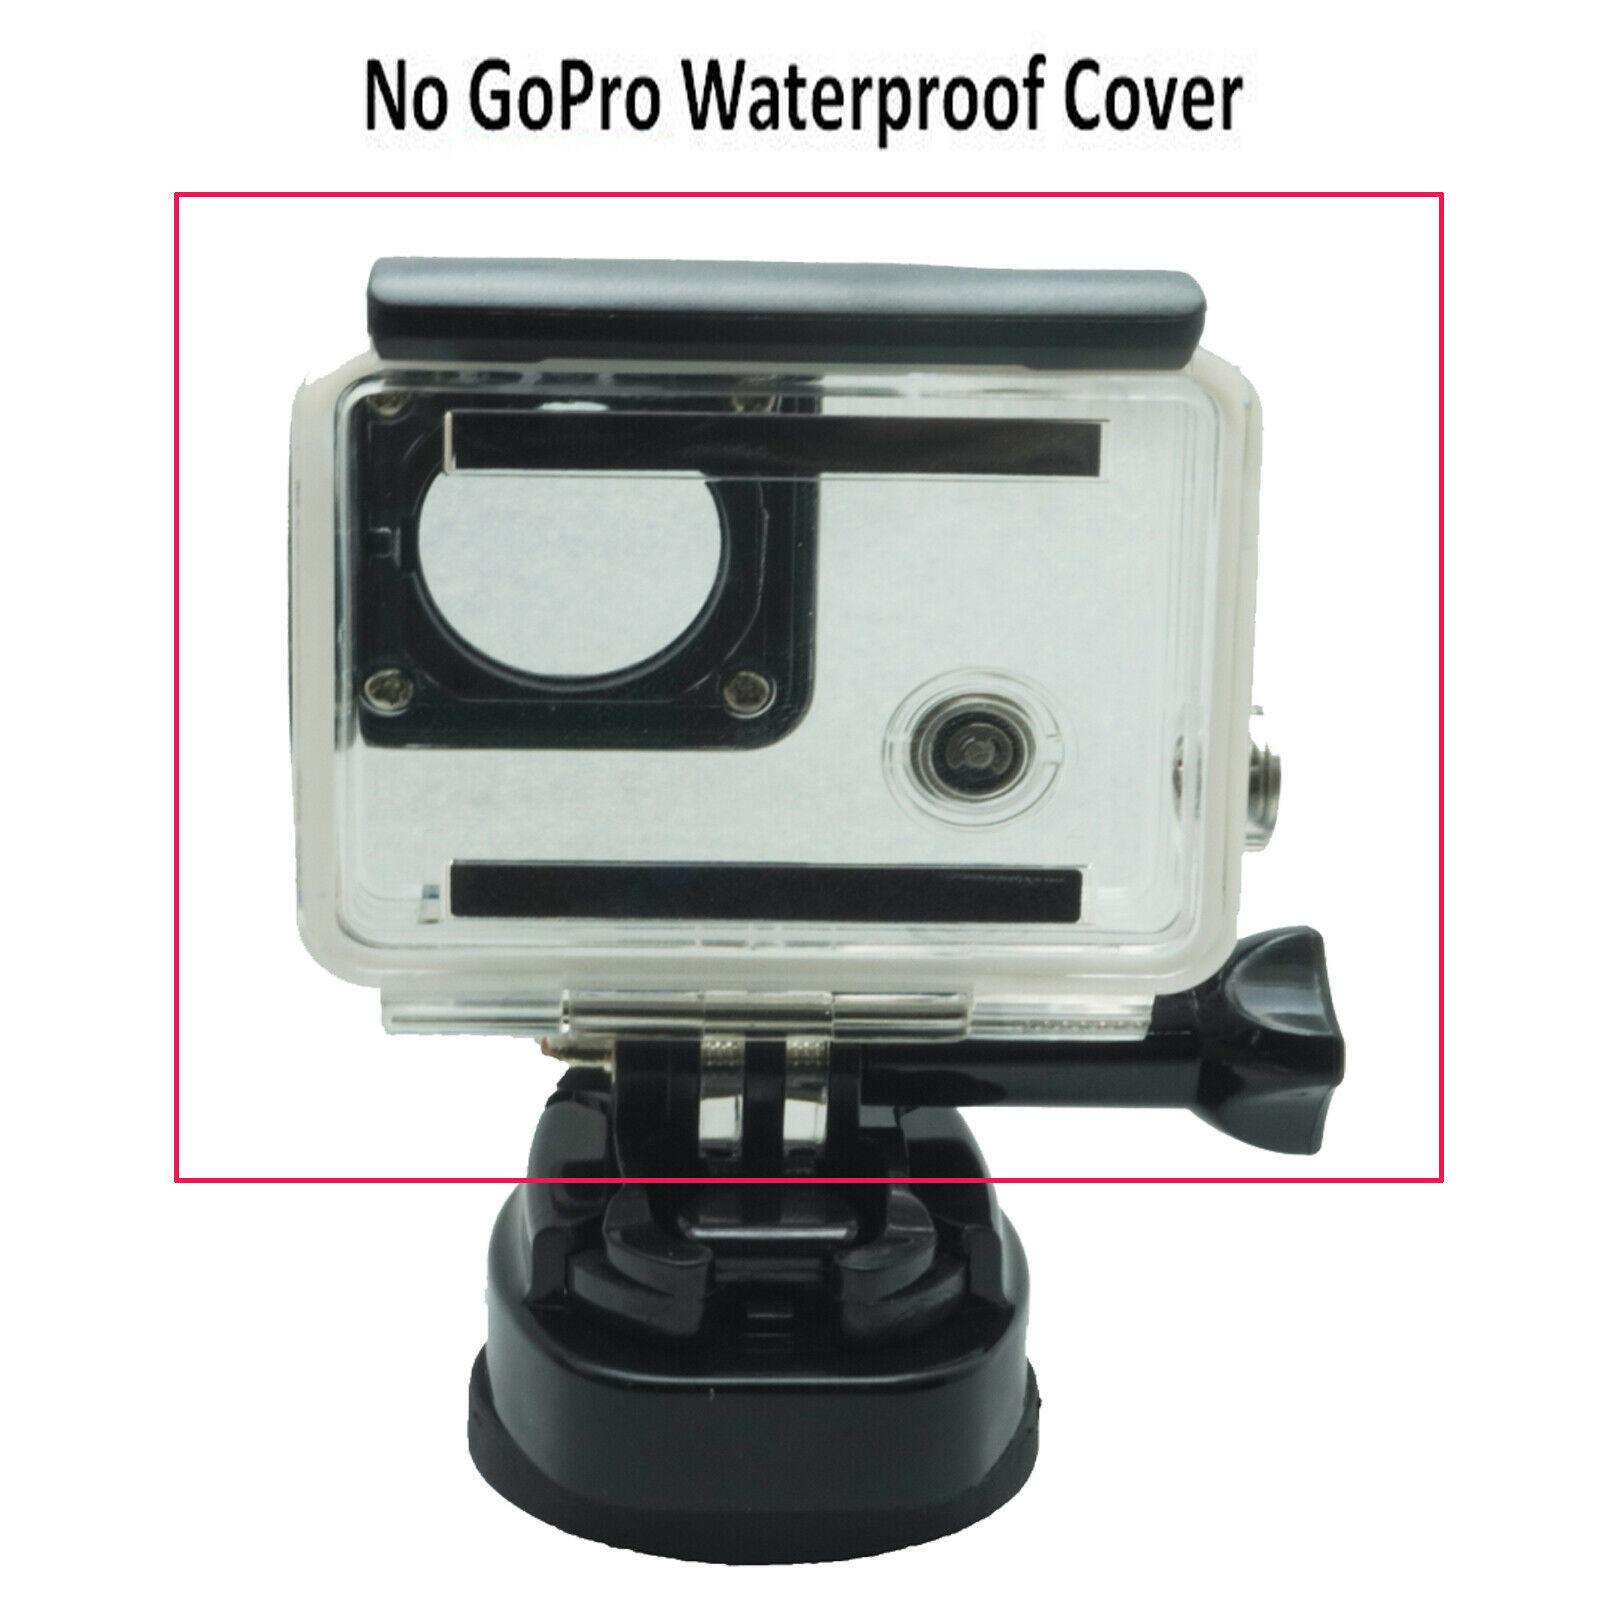 Rubber Coated Magnet Mount for GoPro HERO Cameras